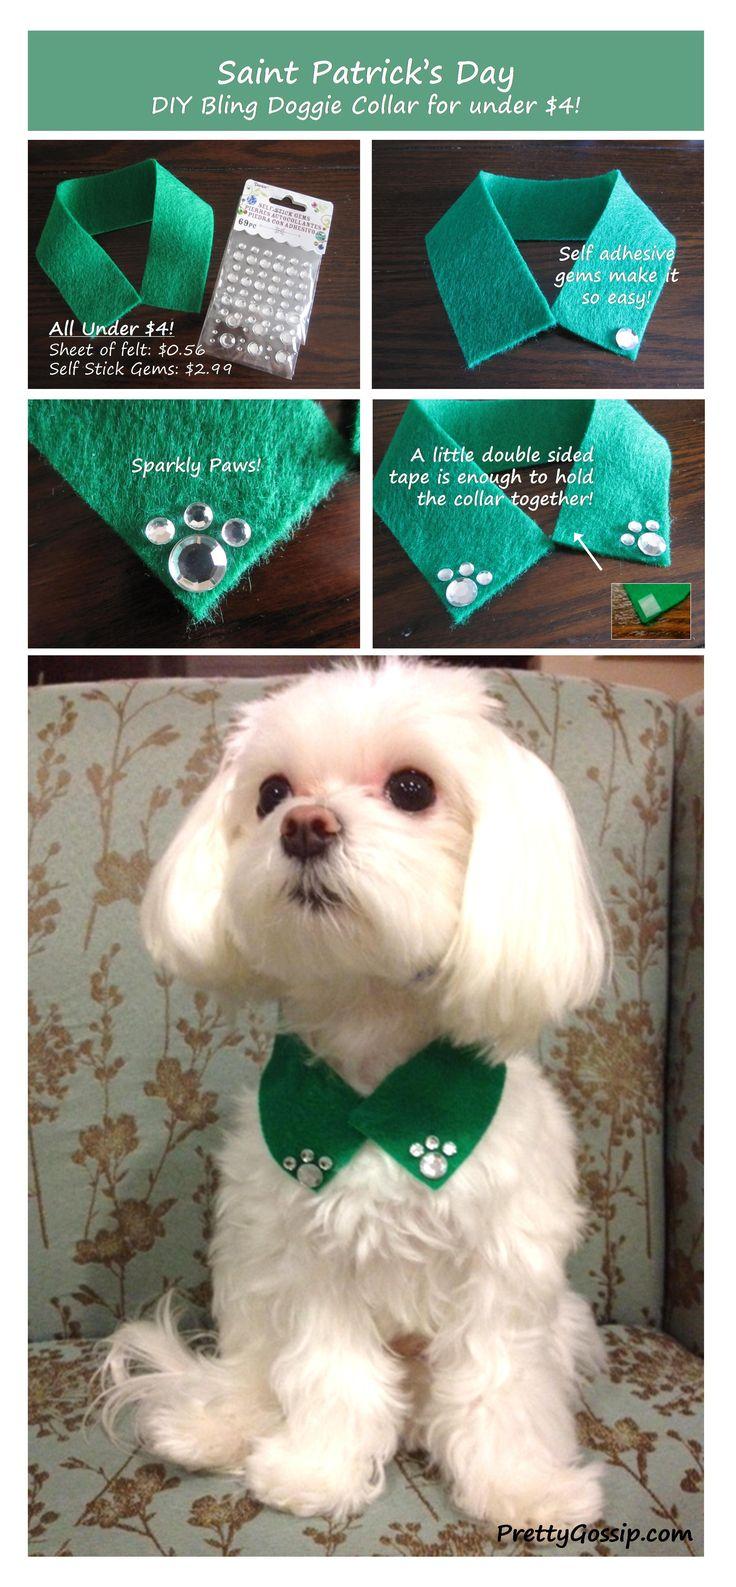 Saint Patrick's Day Inspired DIY Bling Doggie Collar | Pretty Gossip